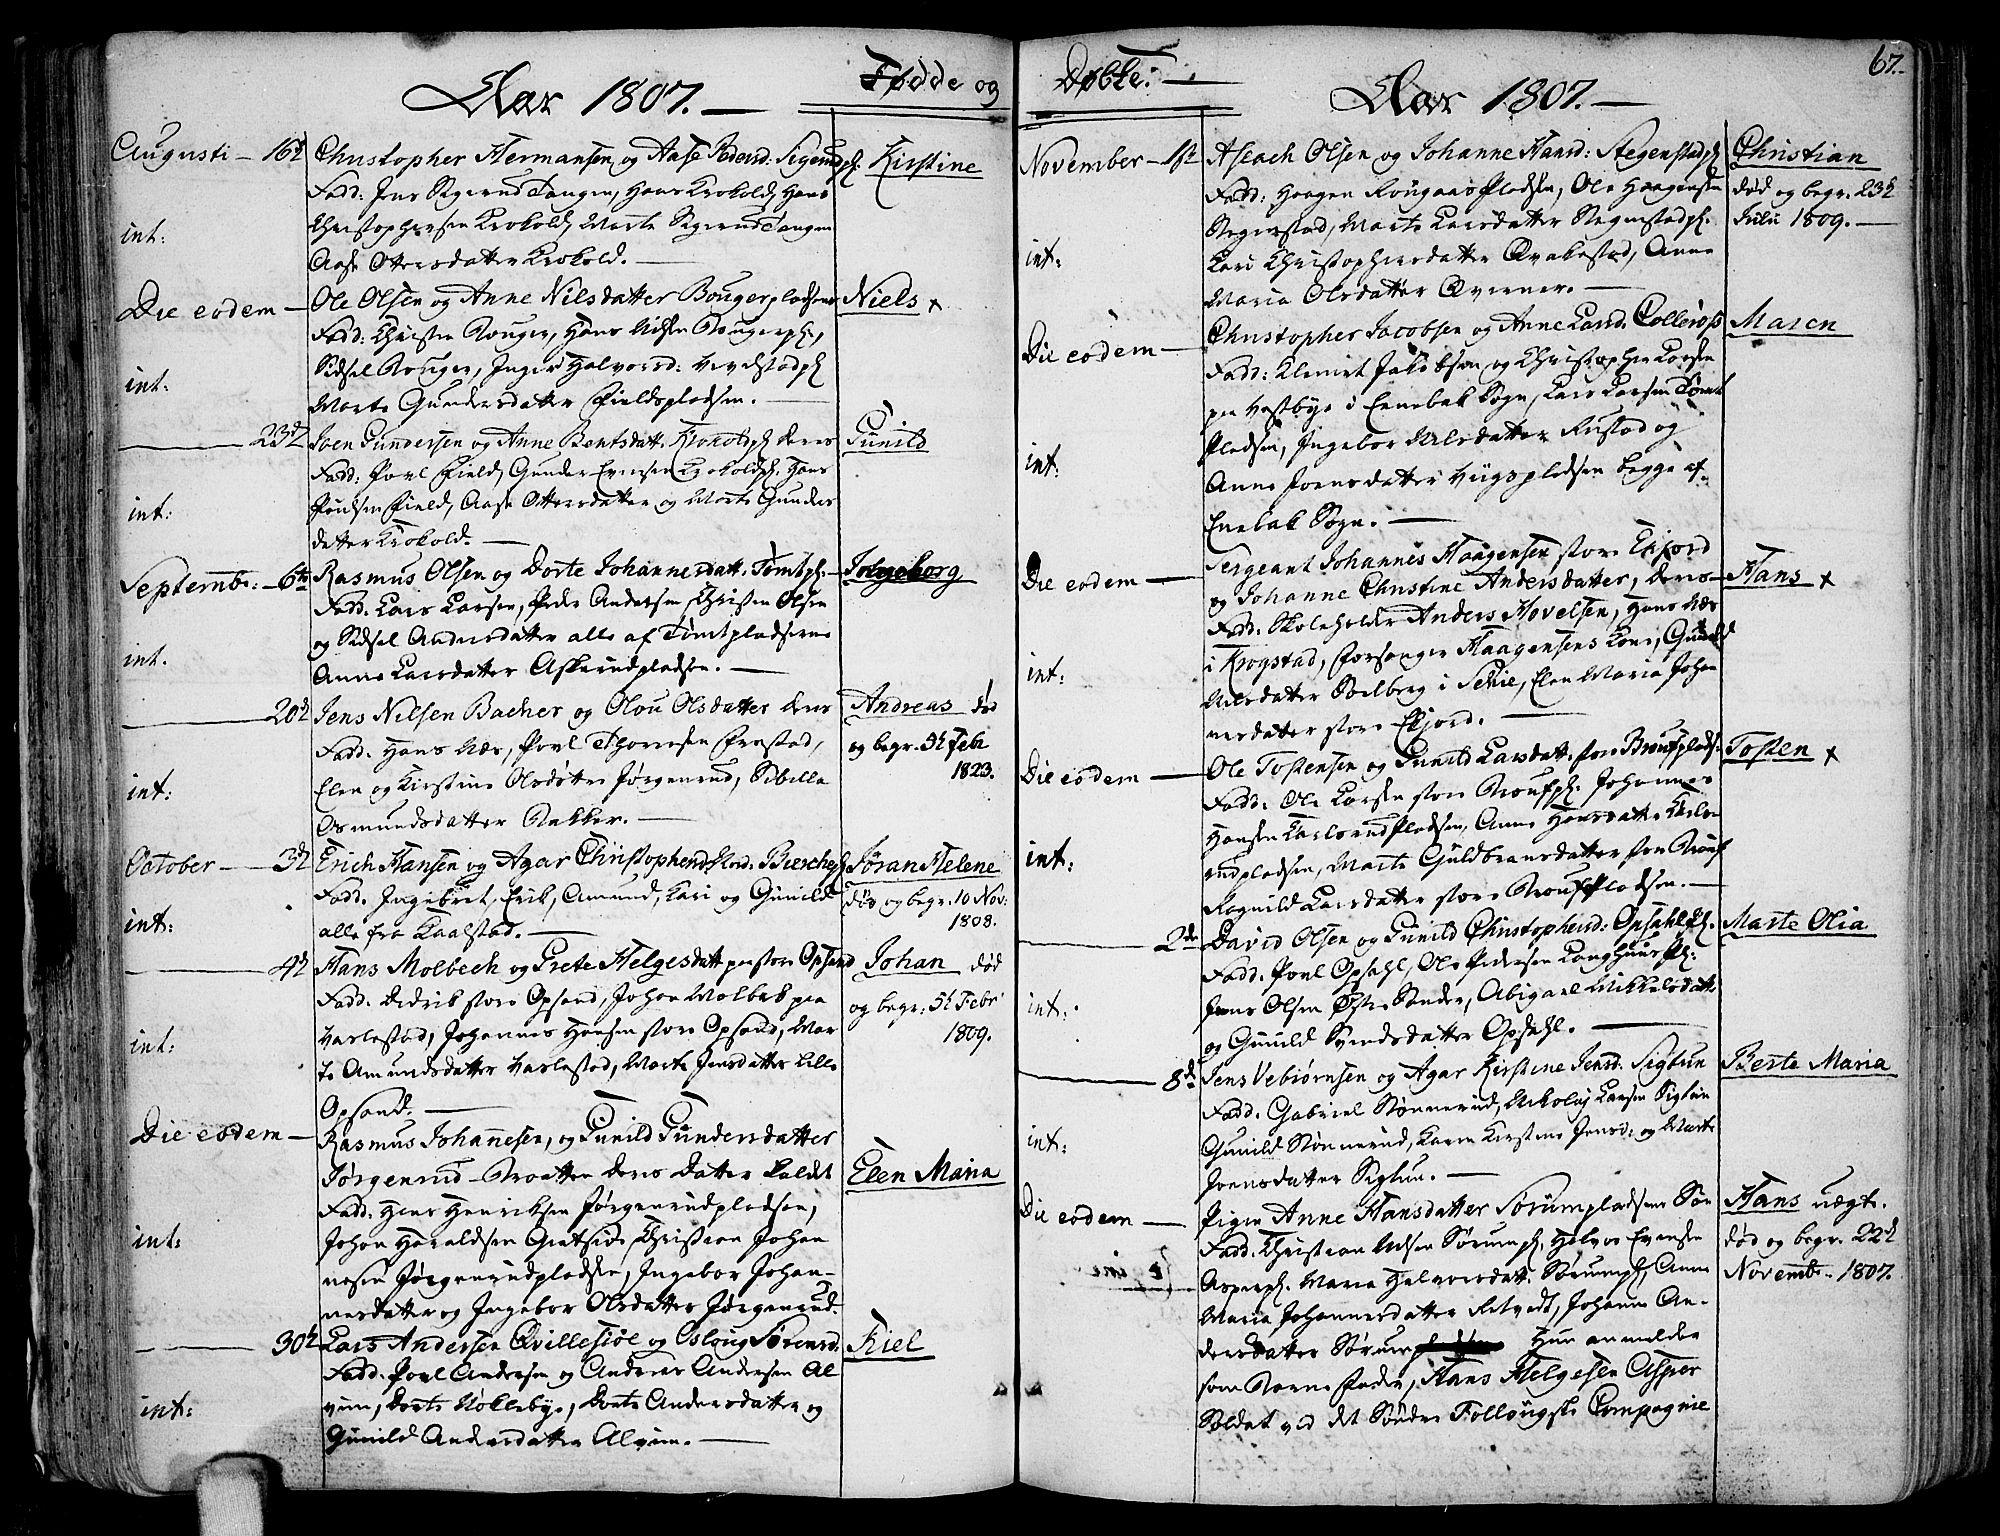 SAO, Kråkstad prestekontor Kirkebøker, F/Fa/L0002: Ministerialbok nr. I 2, 1786-1814, s. 67